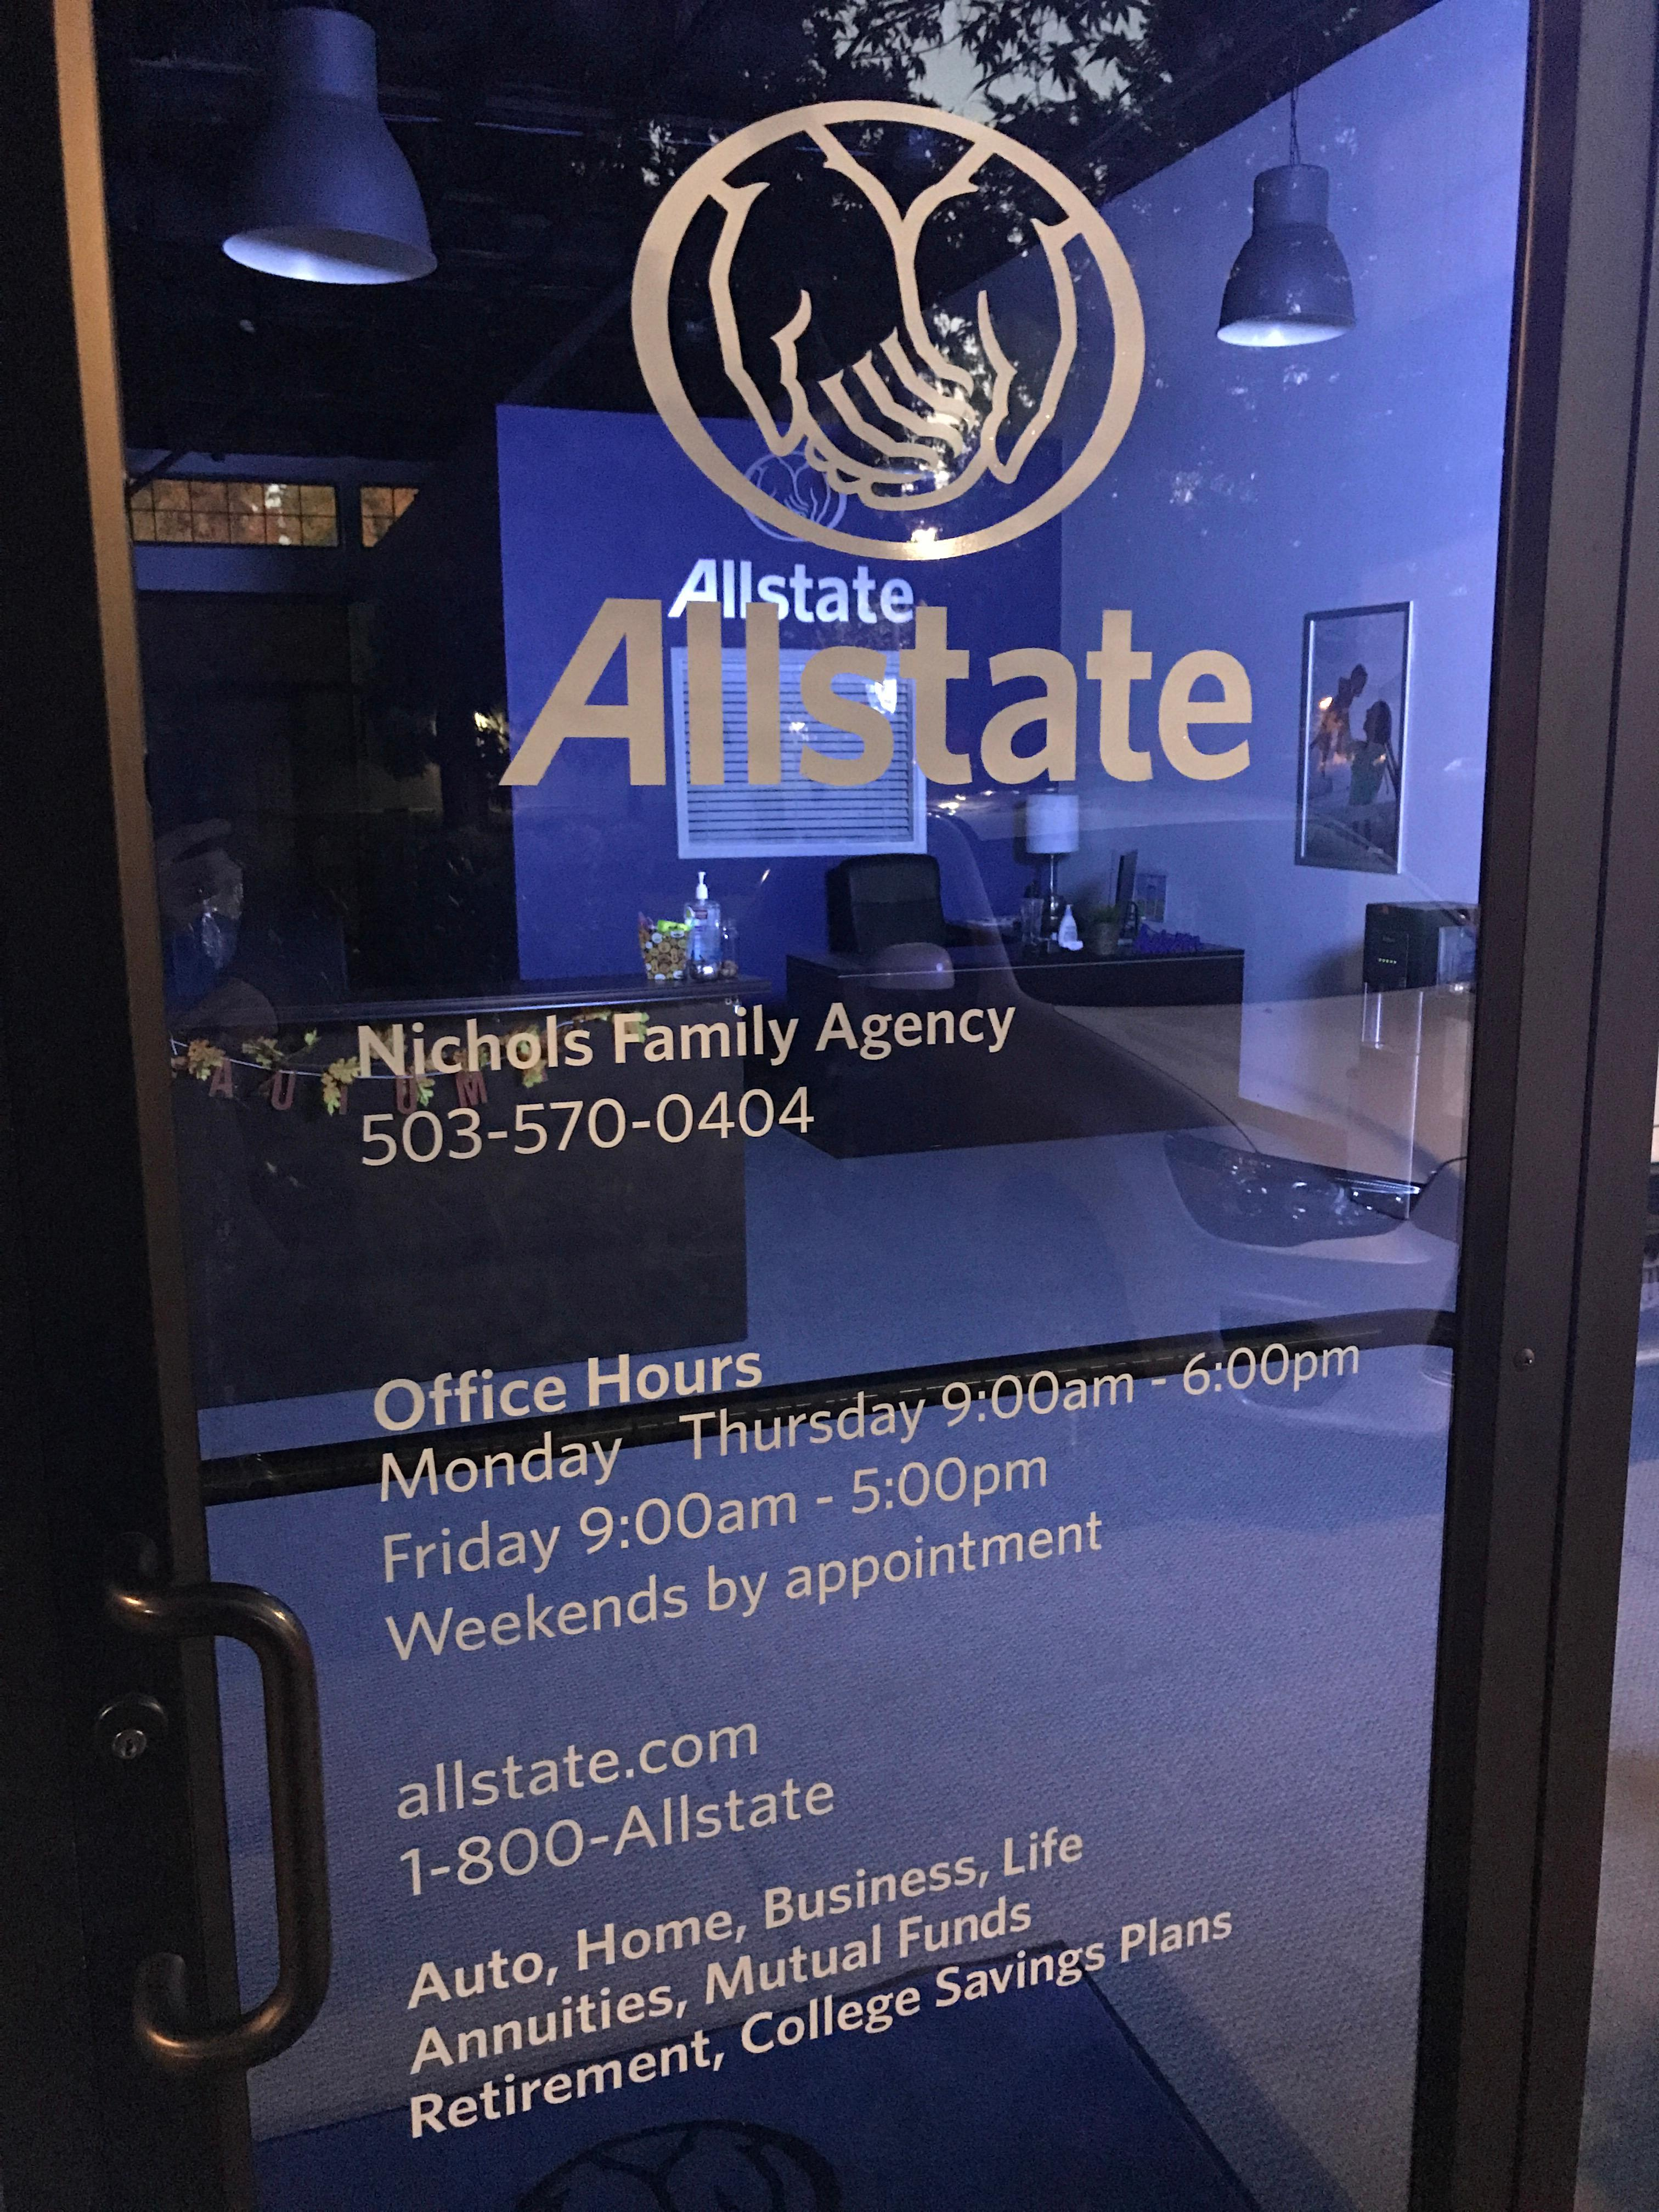 Nichols Family Agency: Allstate Insurance image 11